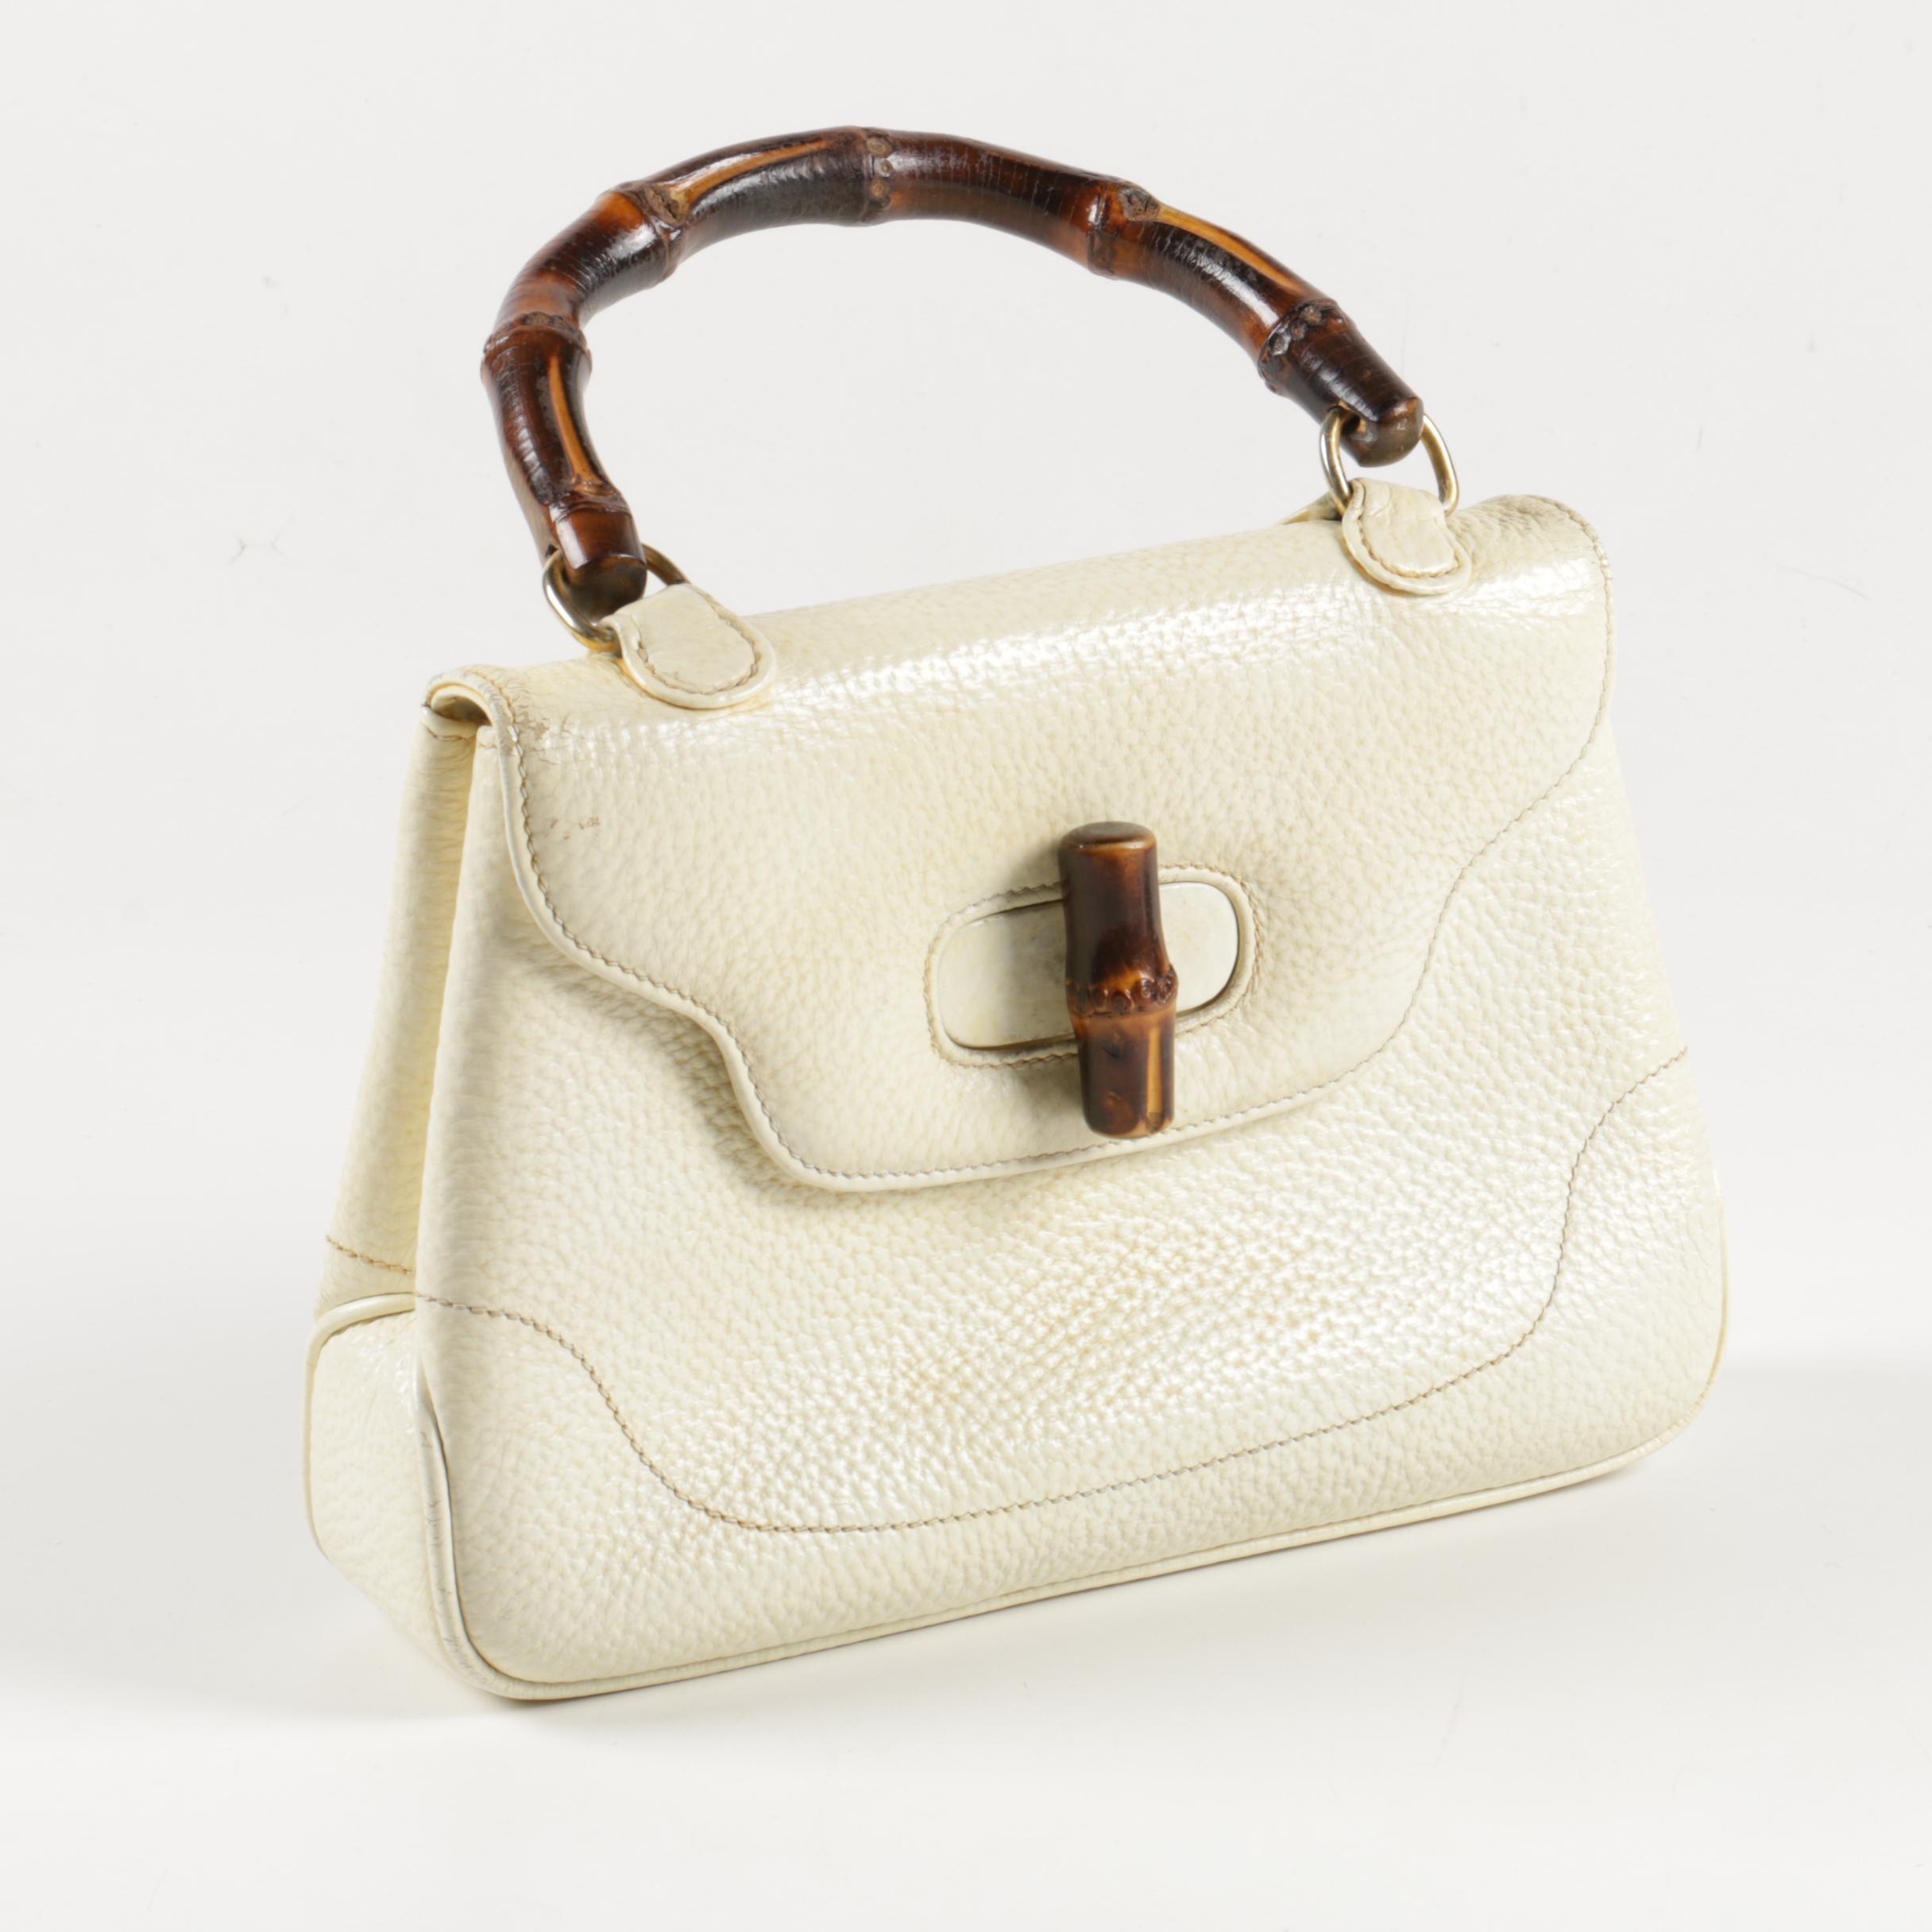 Gucci Cream Leather Handbag